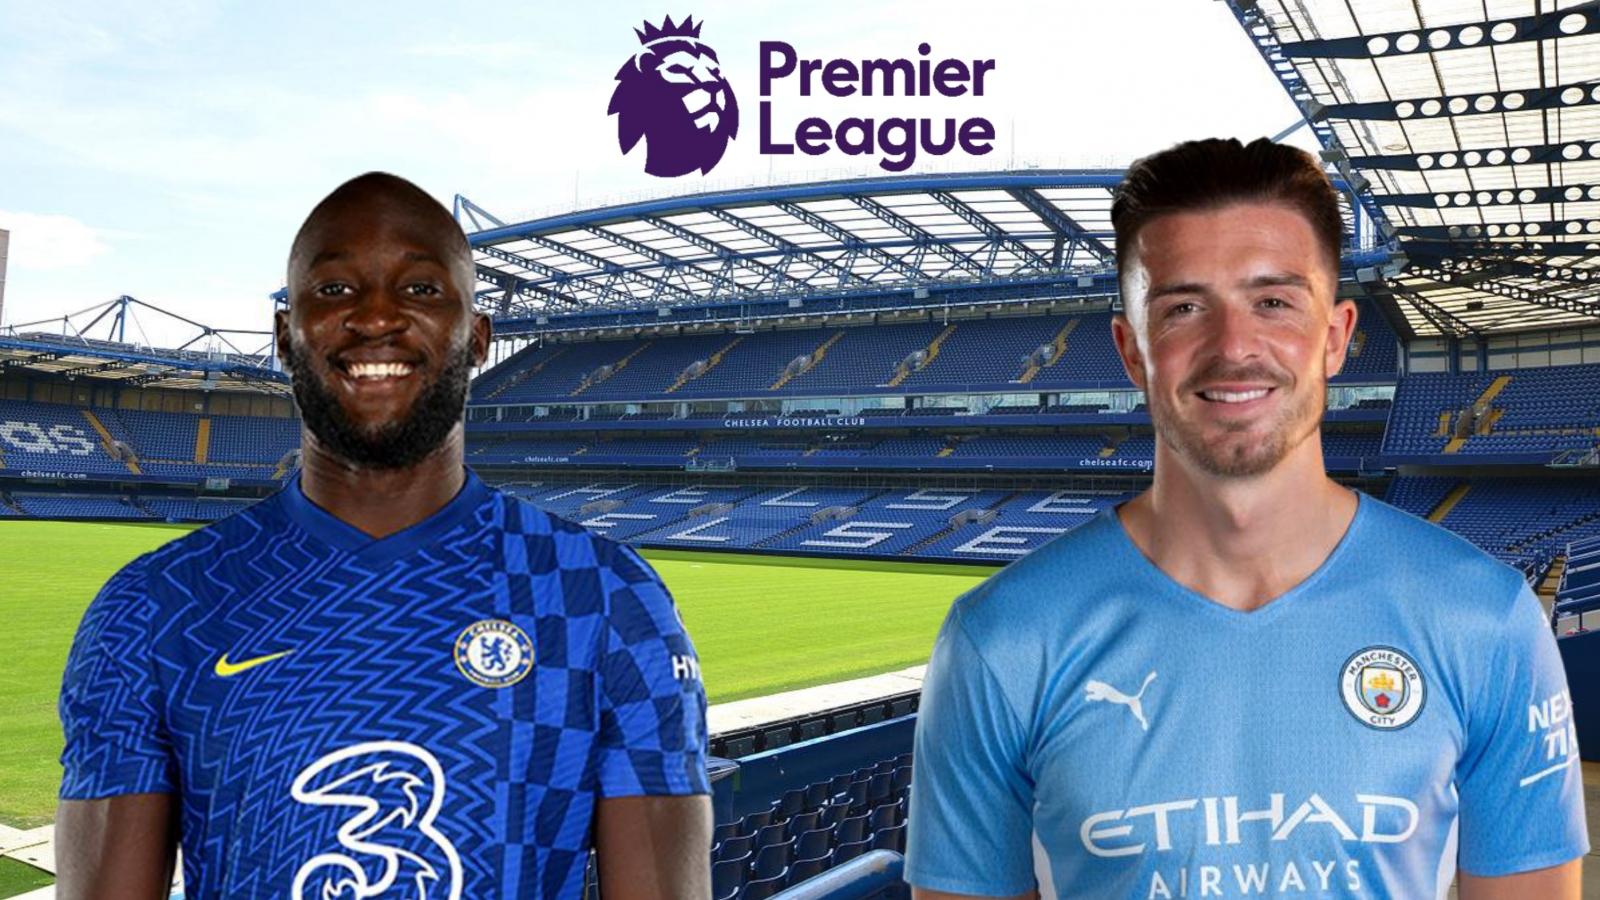 Trực tiếp Chelsea 0-0 Man City: Lukaku đấu Ruben Dias